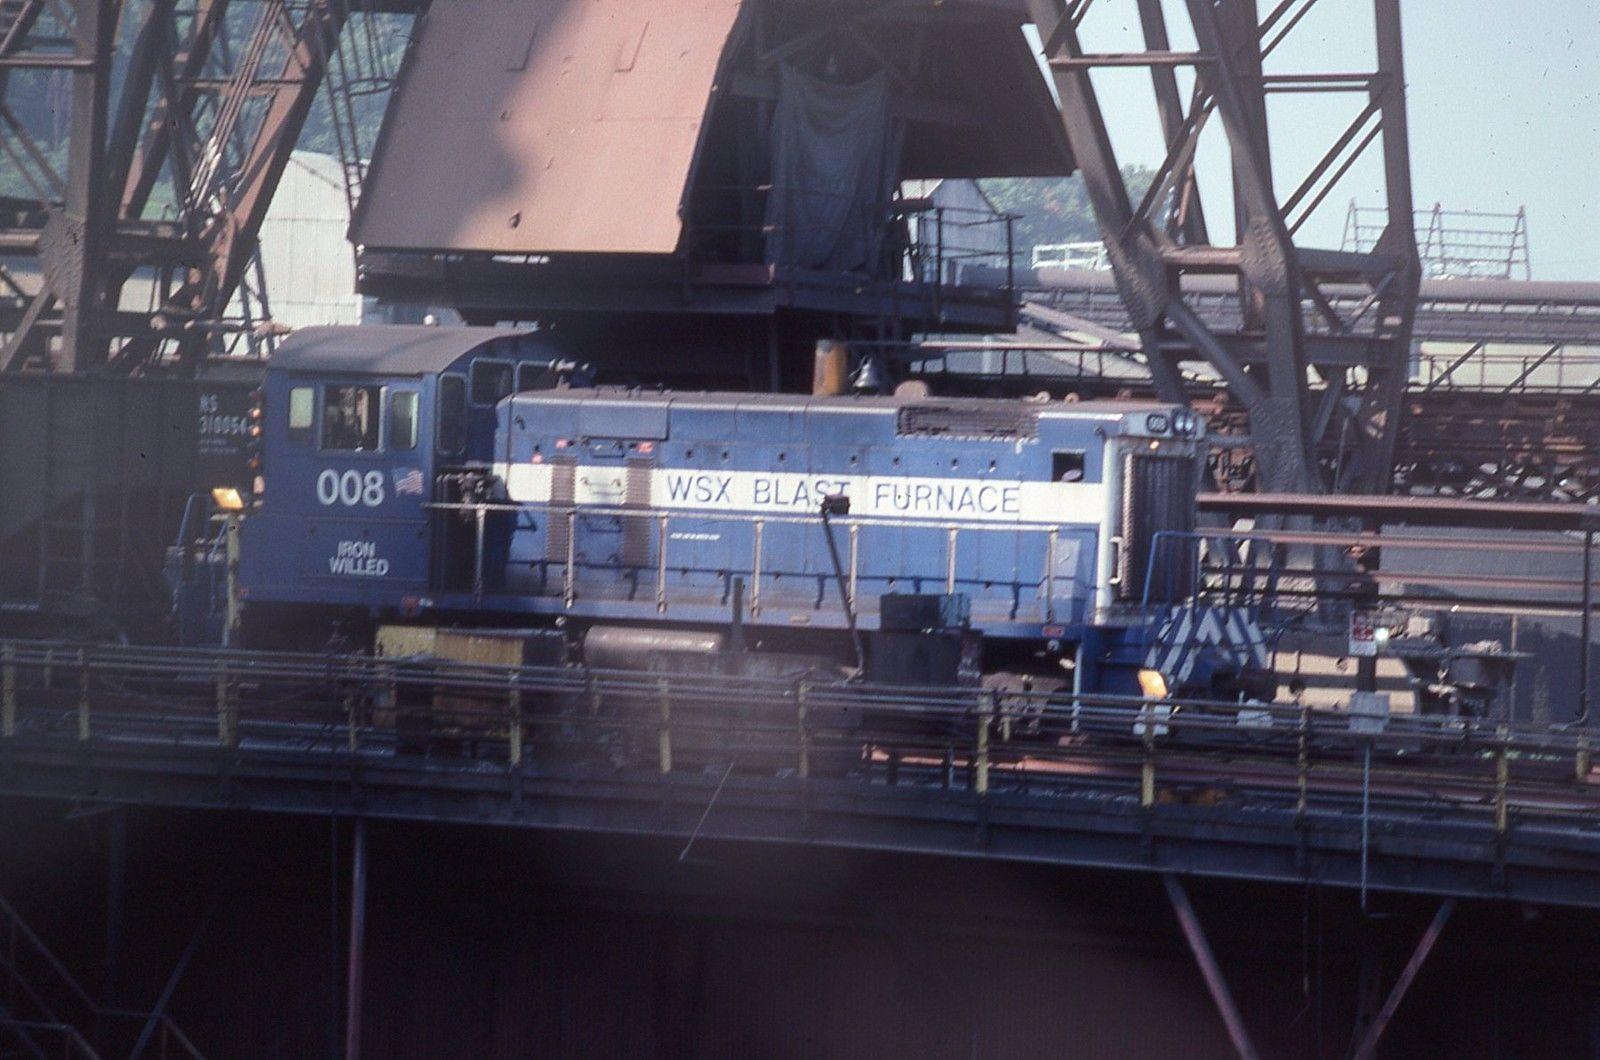 Weirton Steel Corporation S 008 Blast Furnace Switcher Blast Furnace Furnace Train